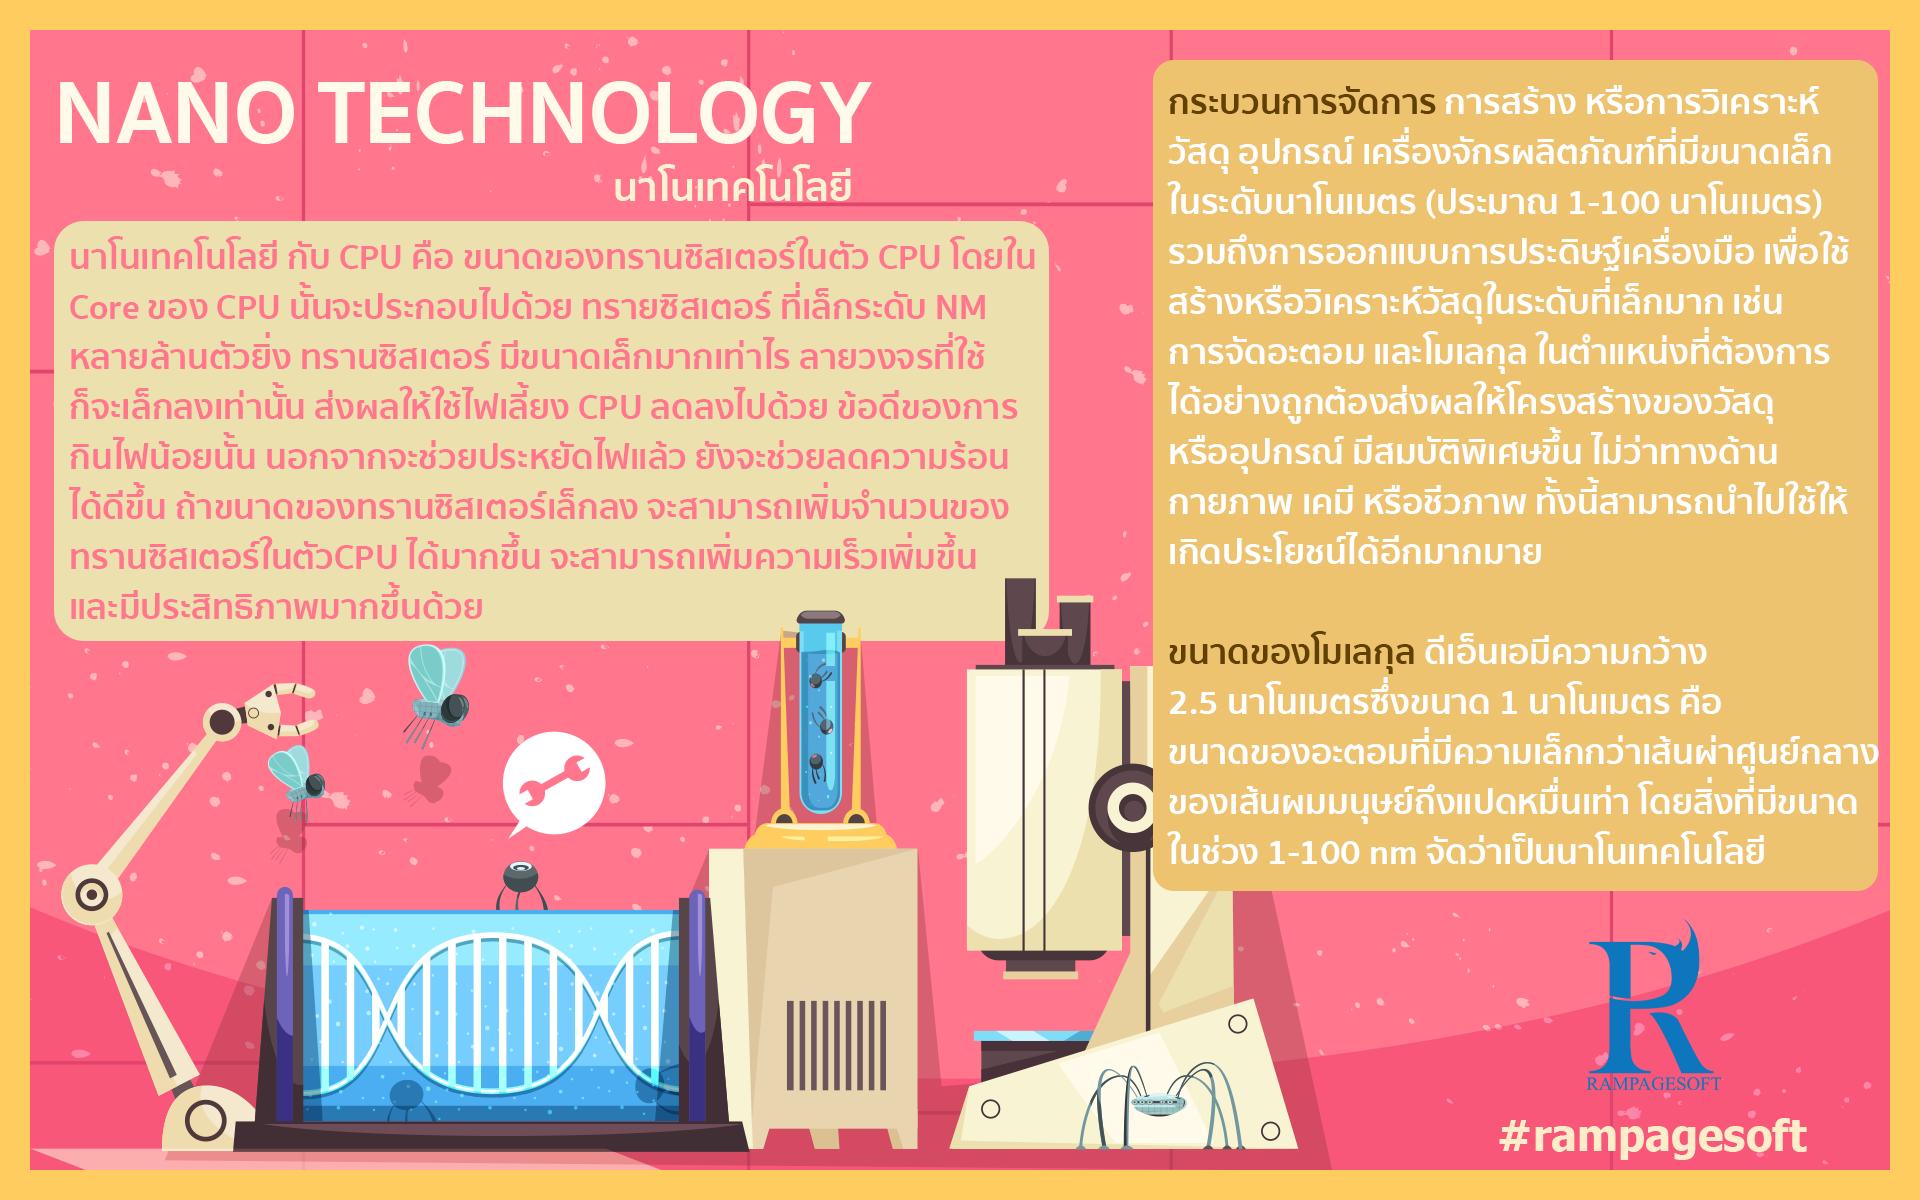 NANO TECHNOLOGY นาโนเทคโนโลยี